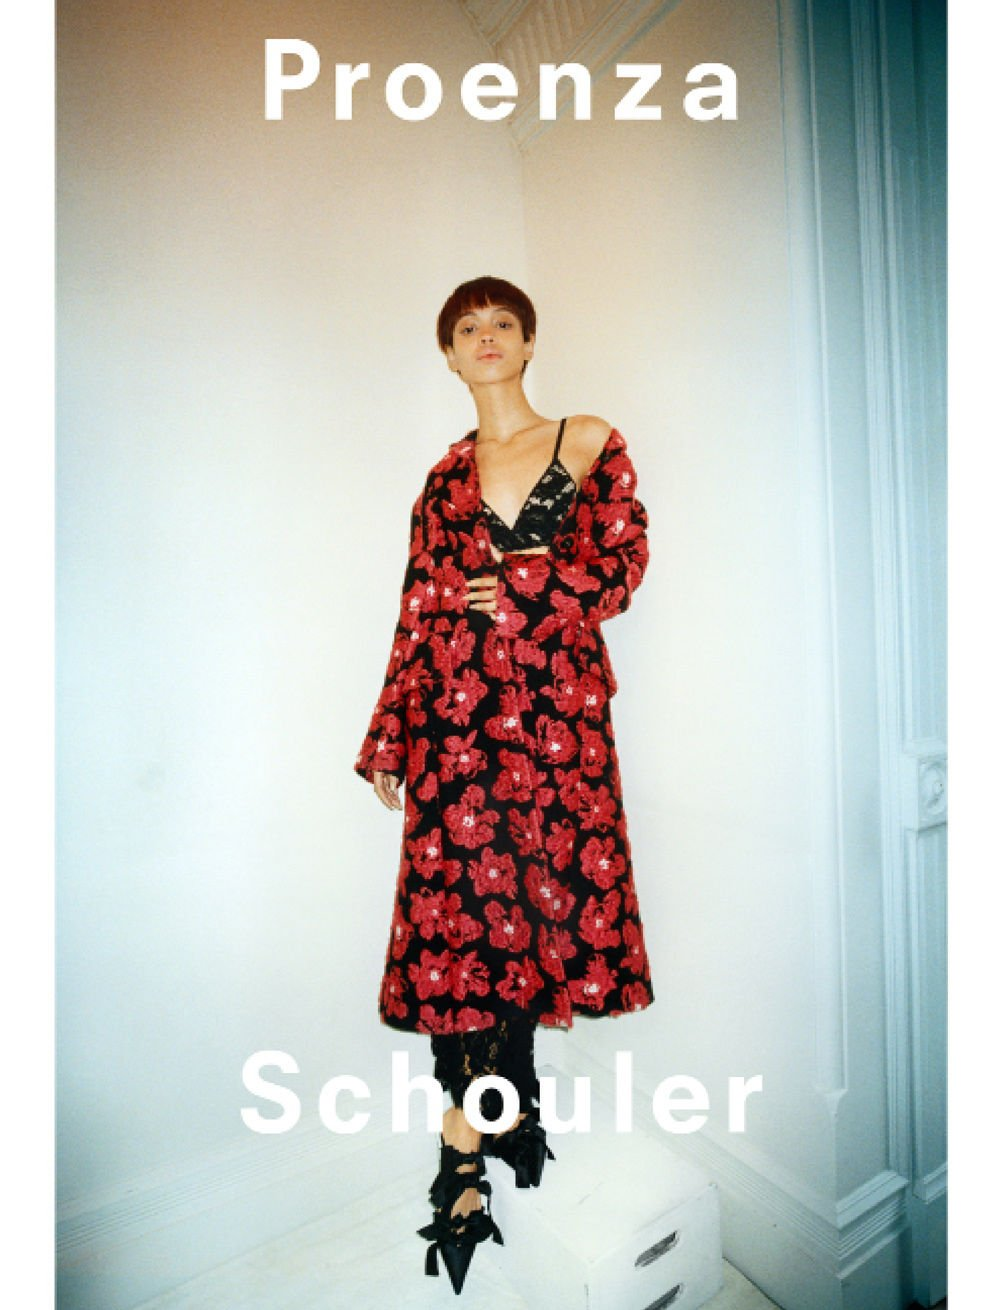 proenza schouler spring 2018 campaign eloisa